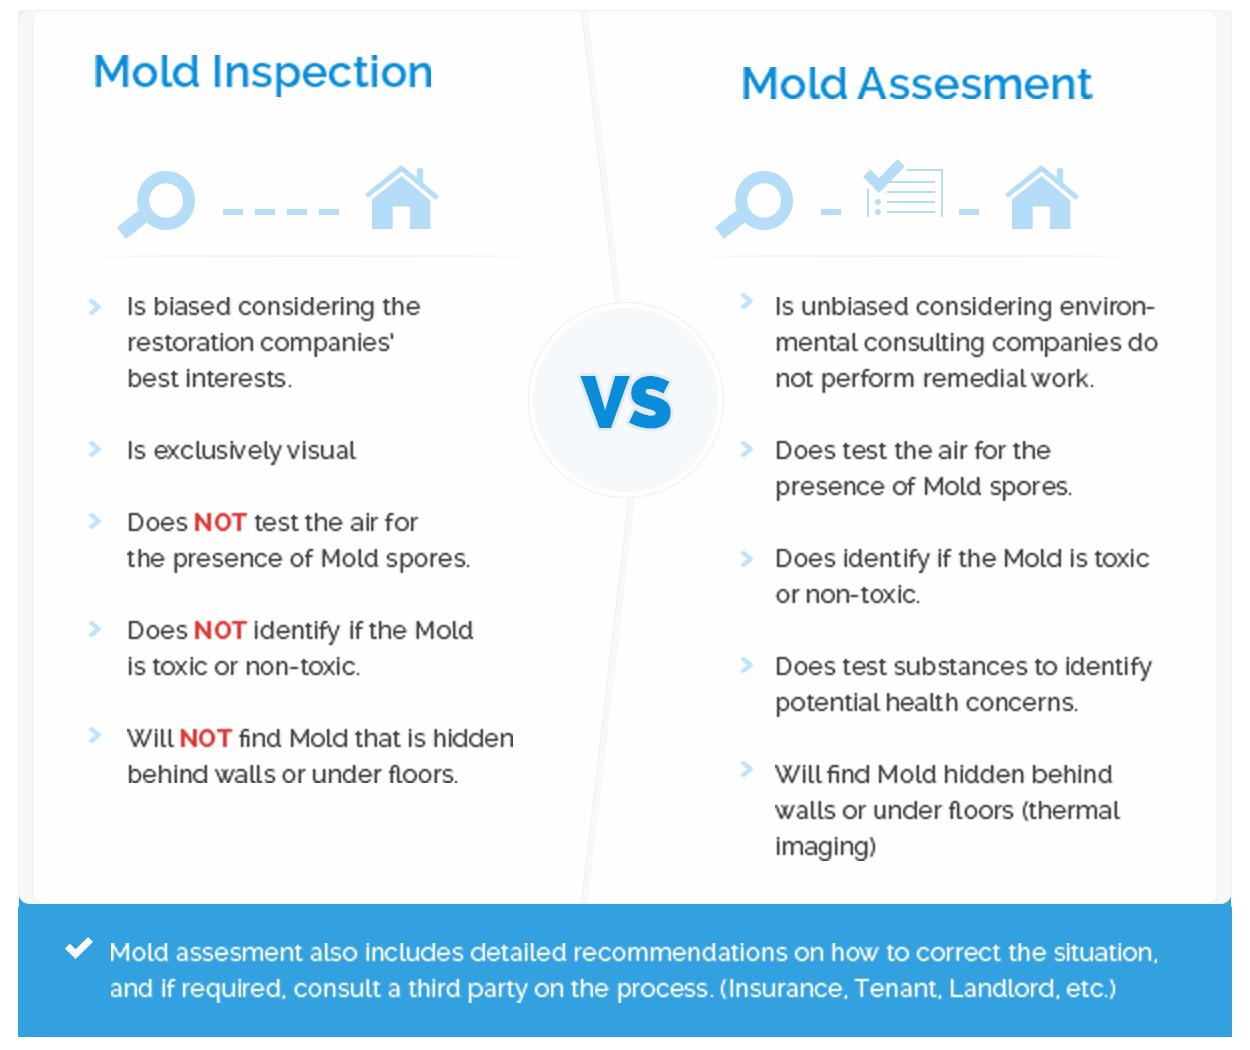 assess-vs-inspect-mould